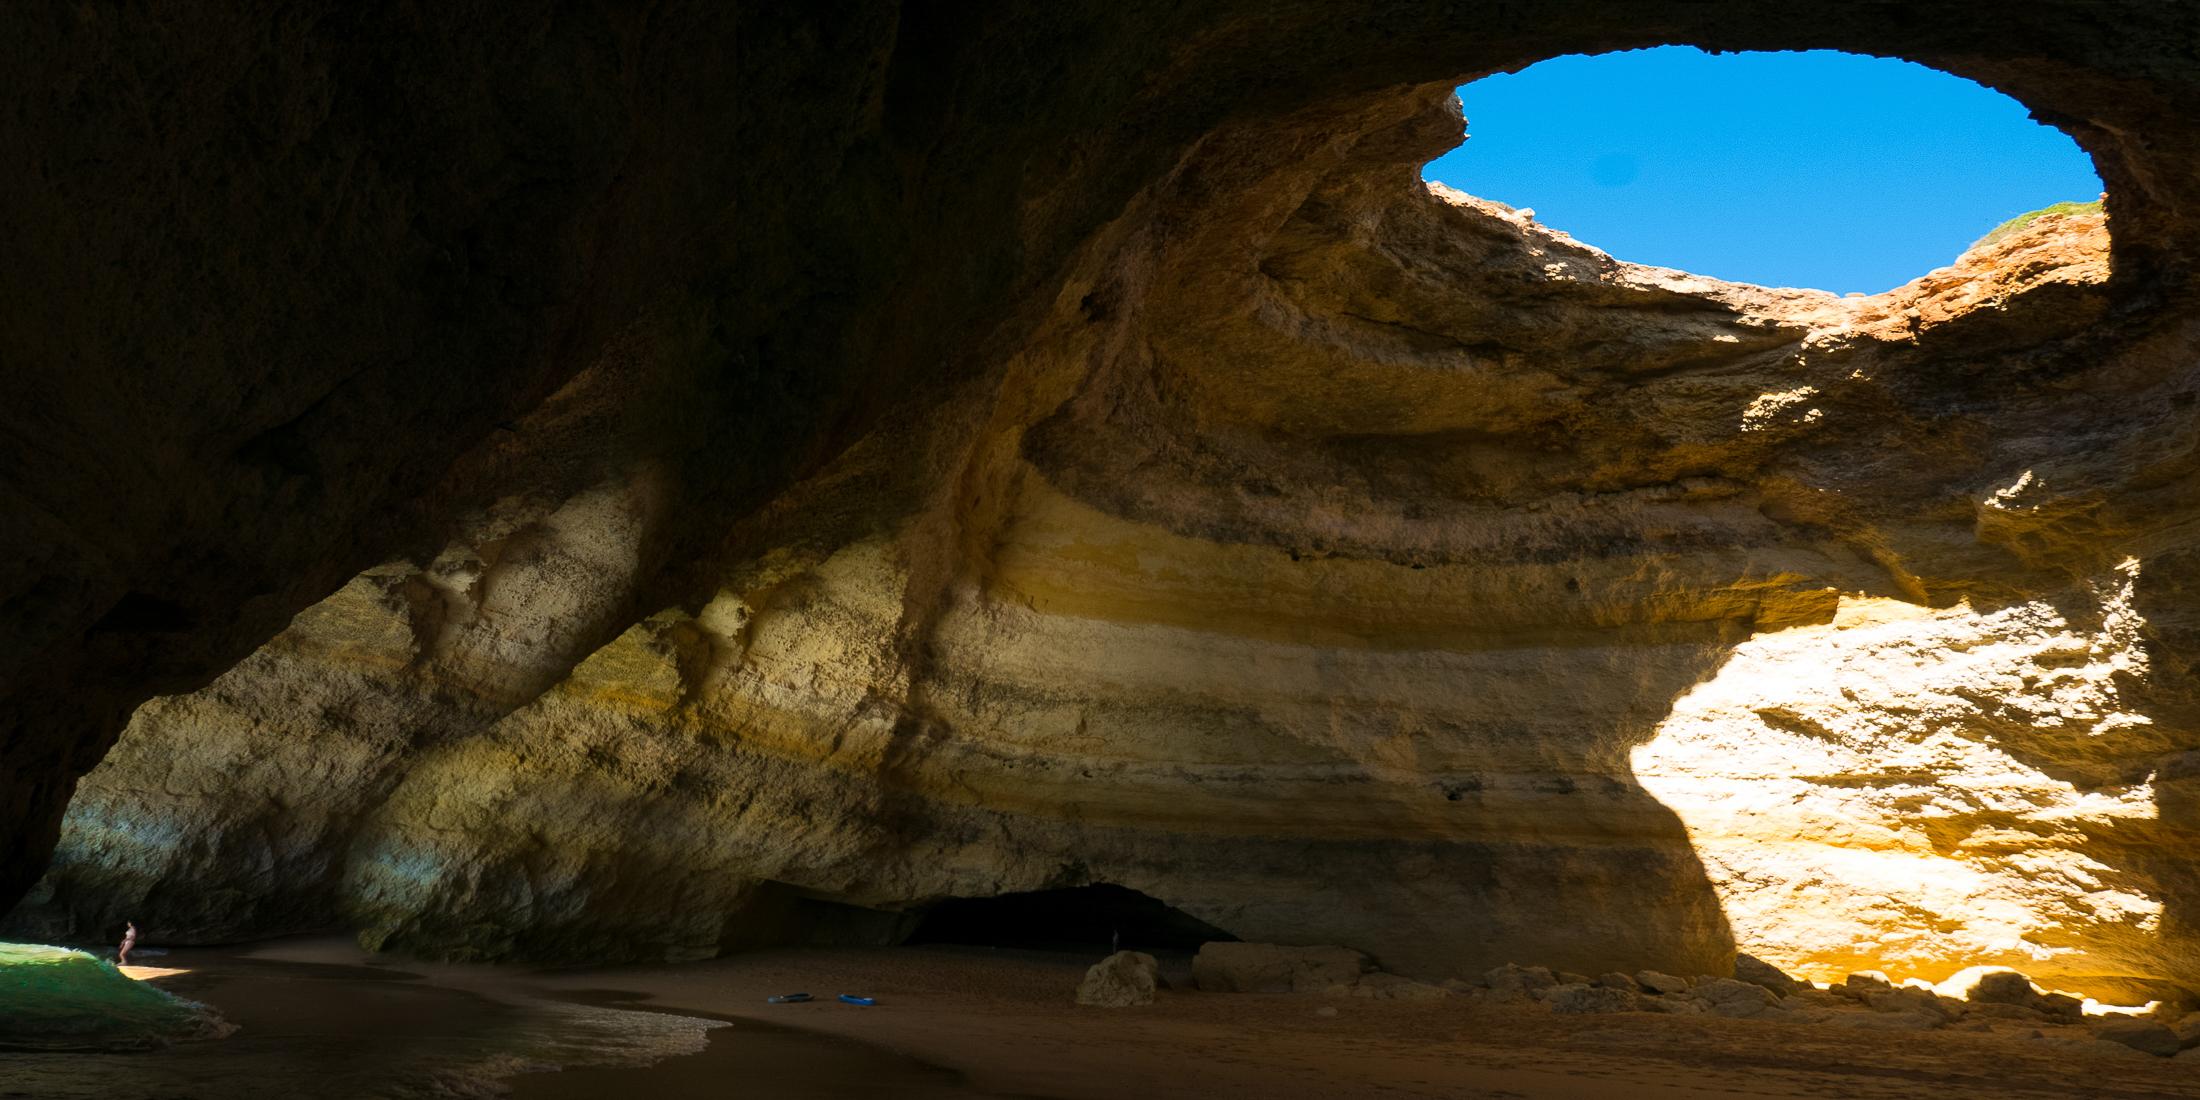 Photo workshops in Lisbon and the Algarve- Algarve: inside Benagil sea cave